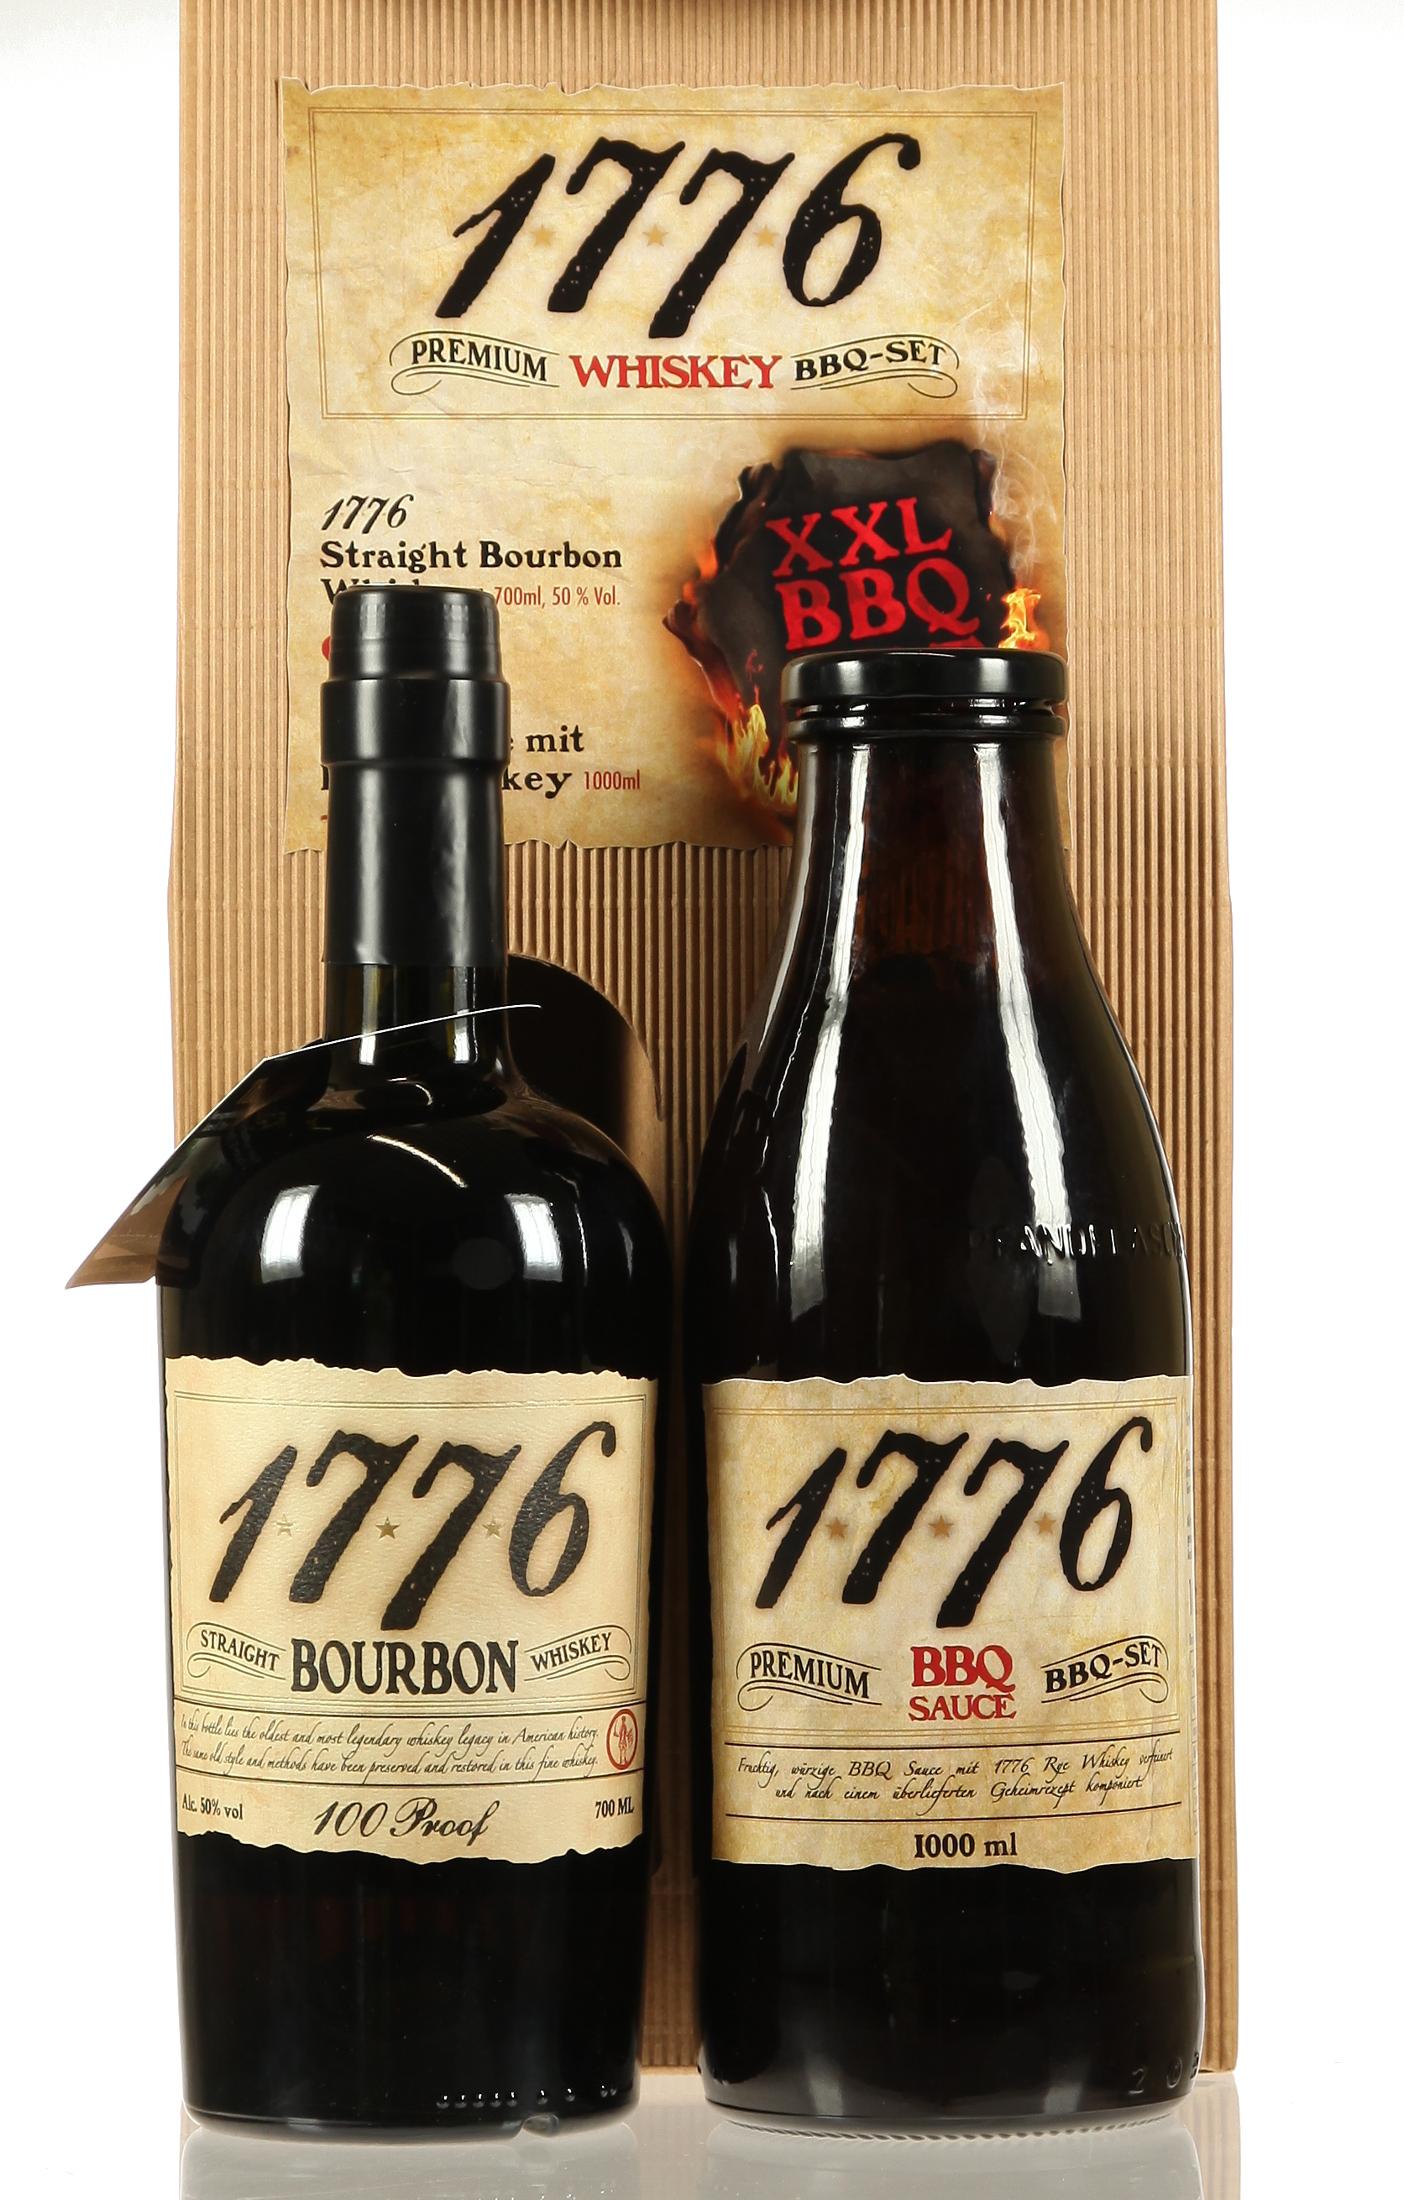 1776 Bourbon XXL BBQ-Set